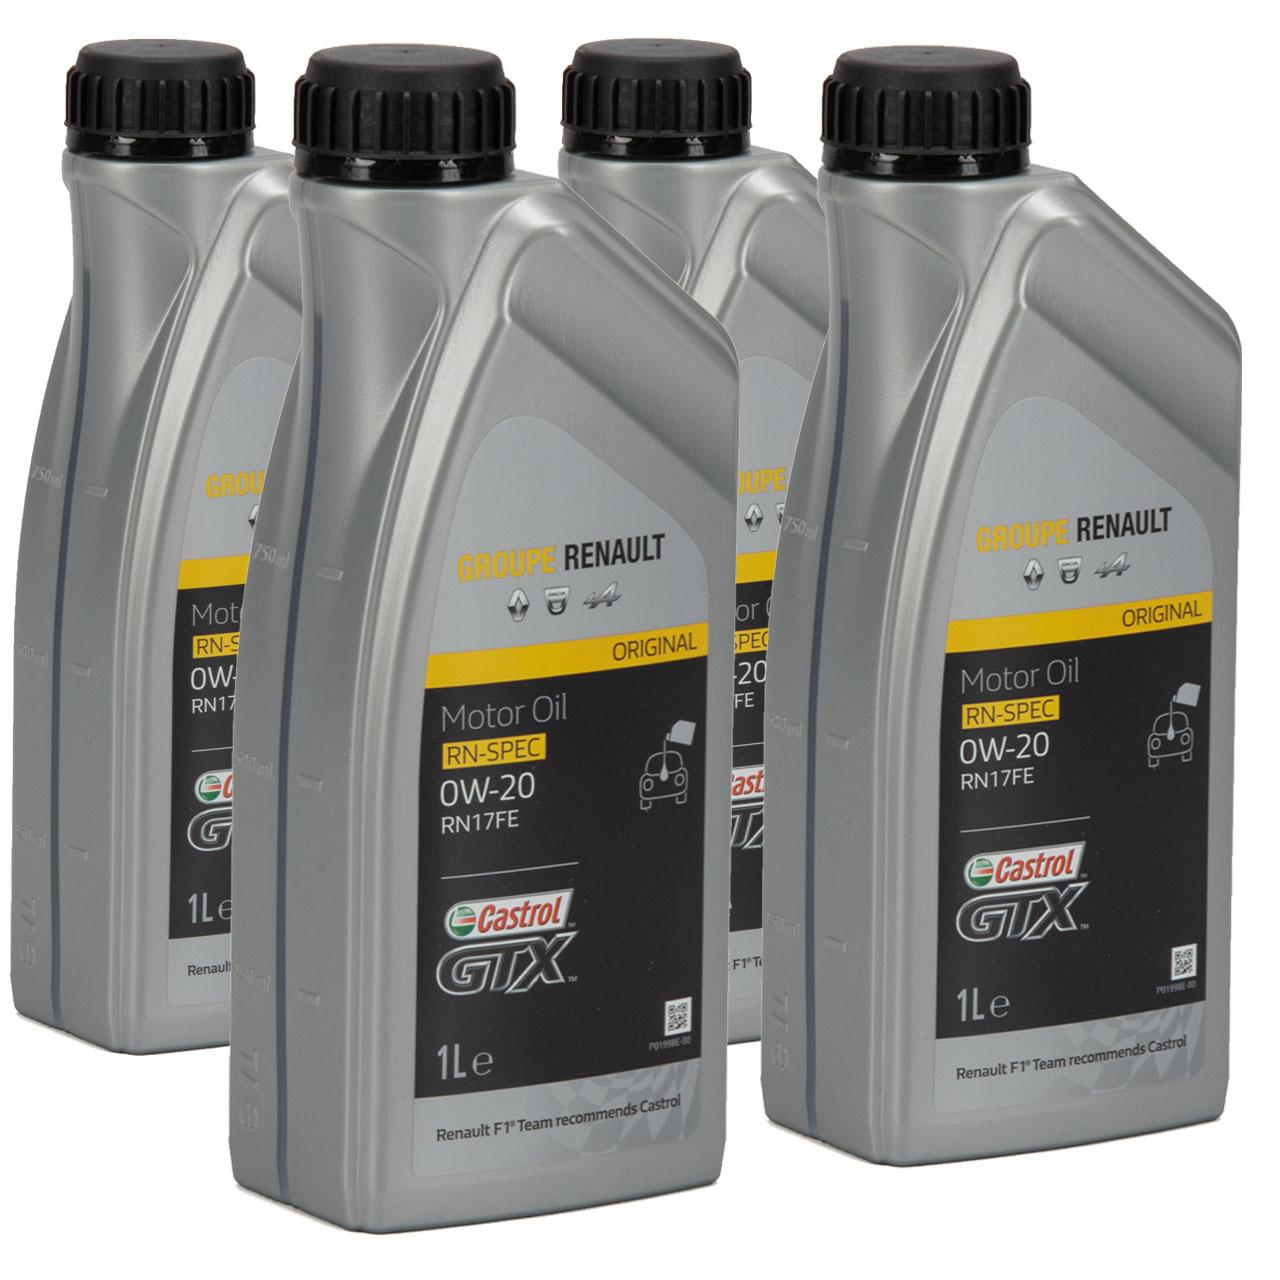 CASTROL Motoröl Öl GTX RN-SPEC 0W-20 0W20 für Renault RN17FE - 4L 4 Liter